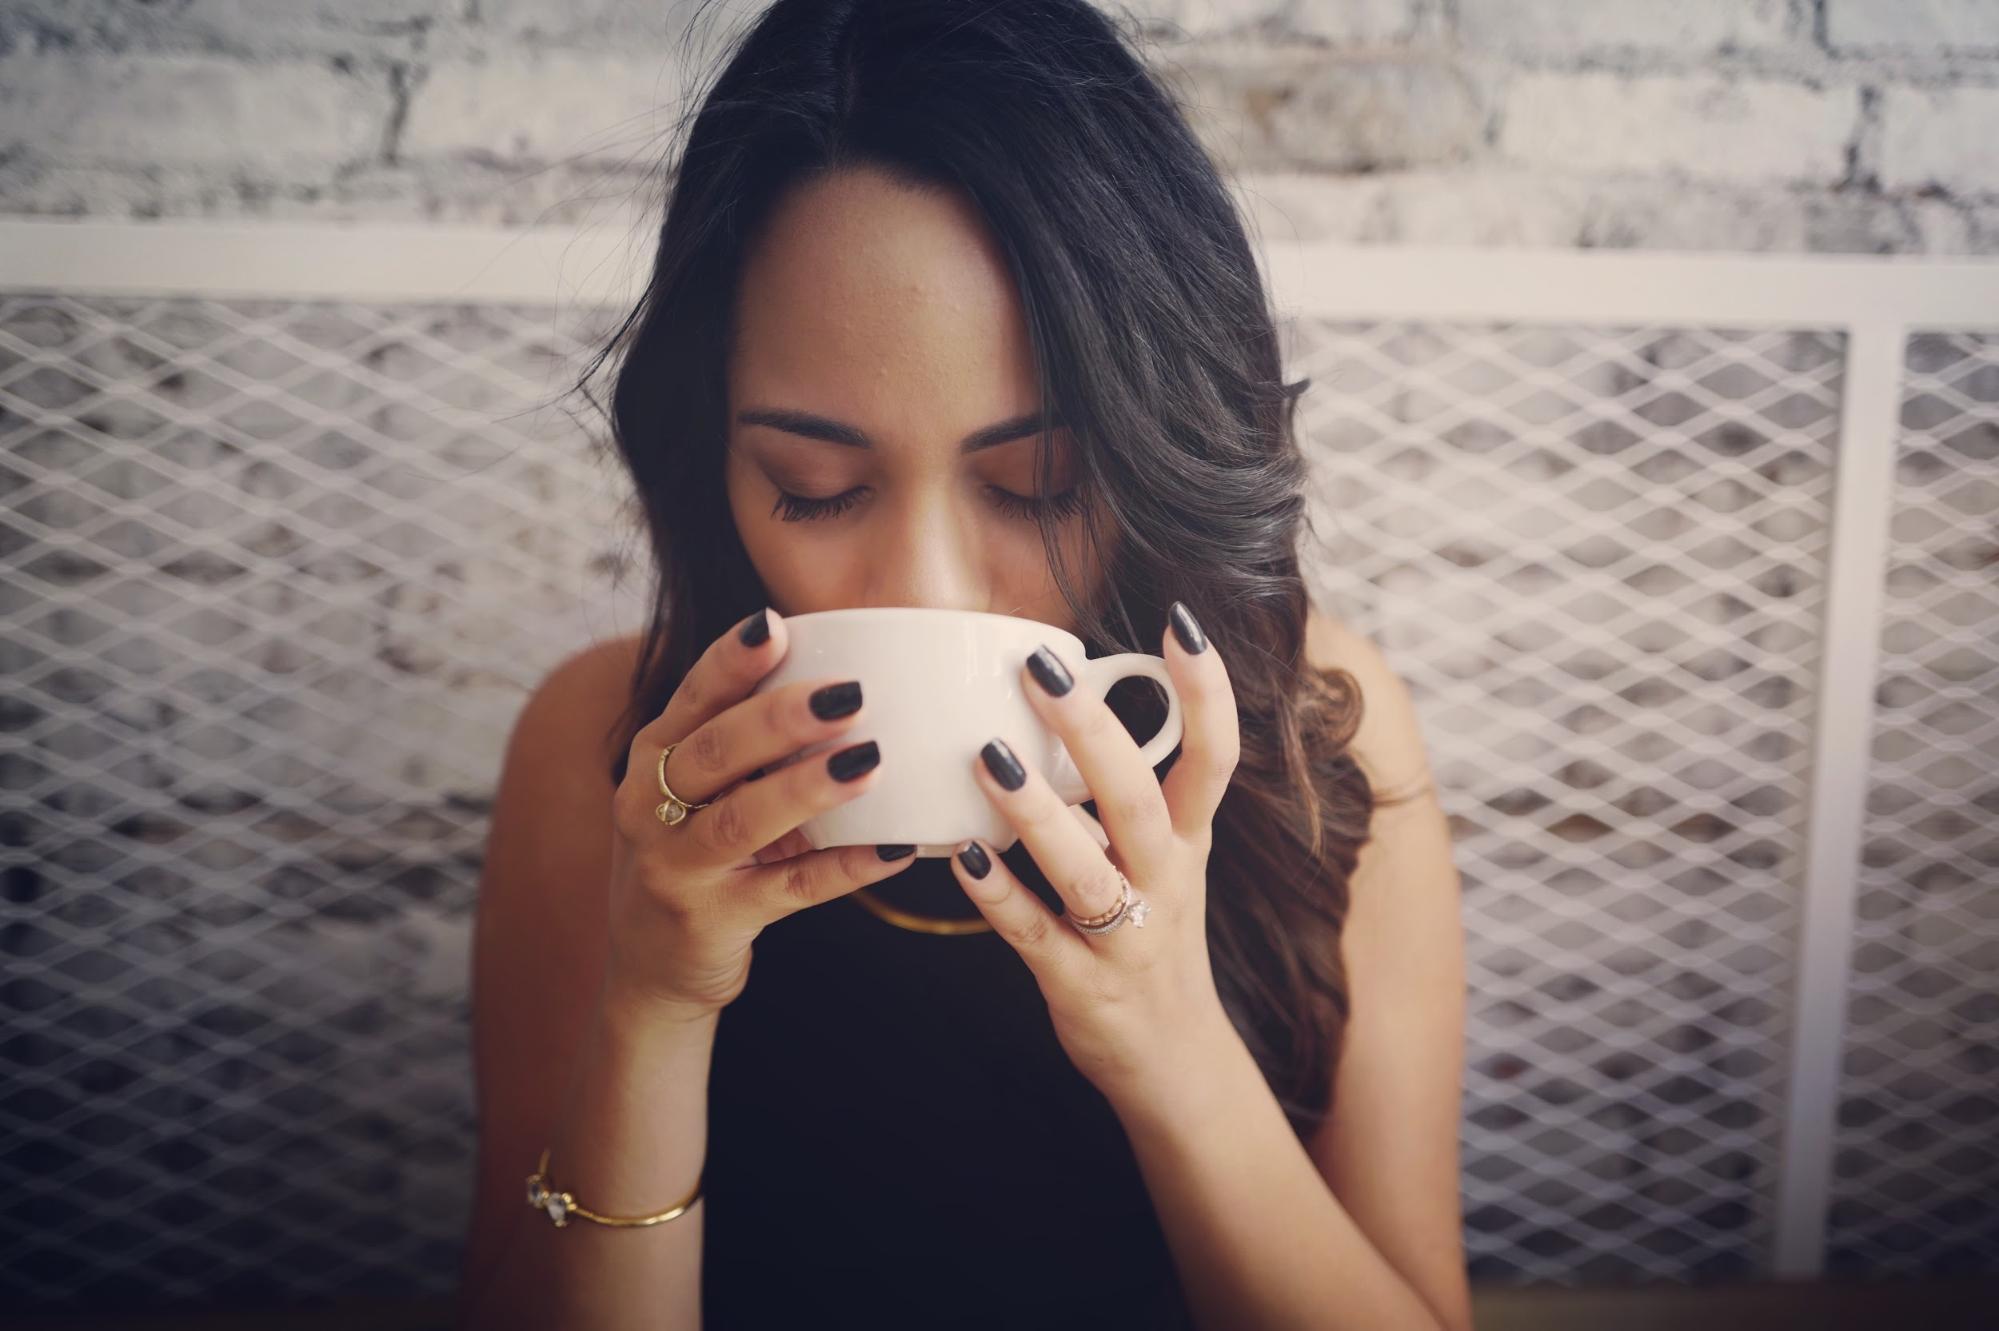 Hot drinks and sleep = healthy